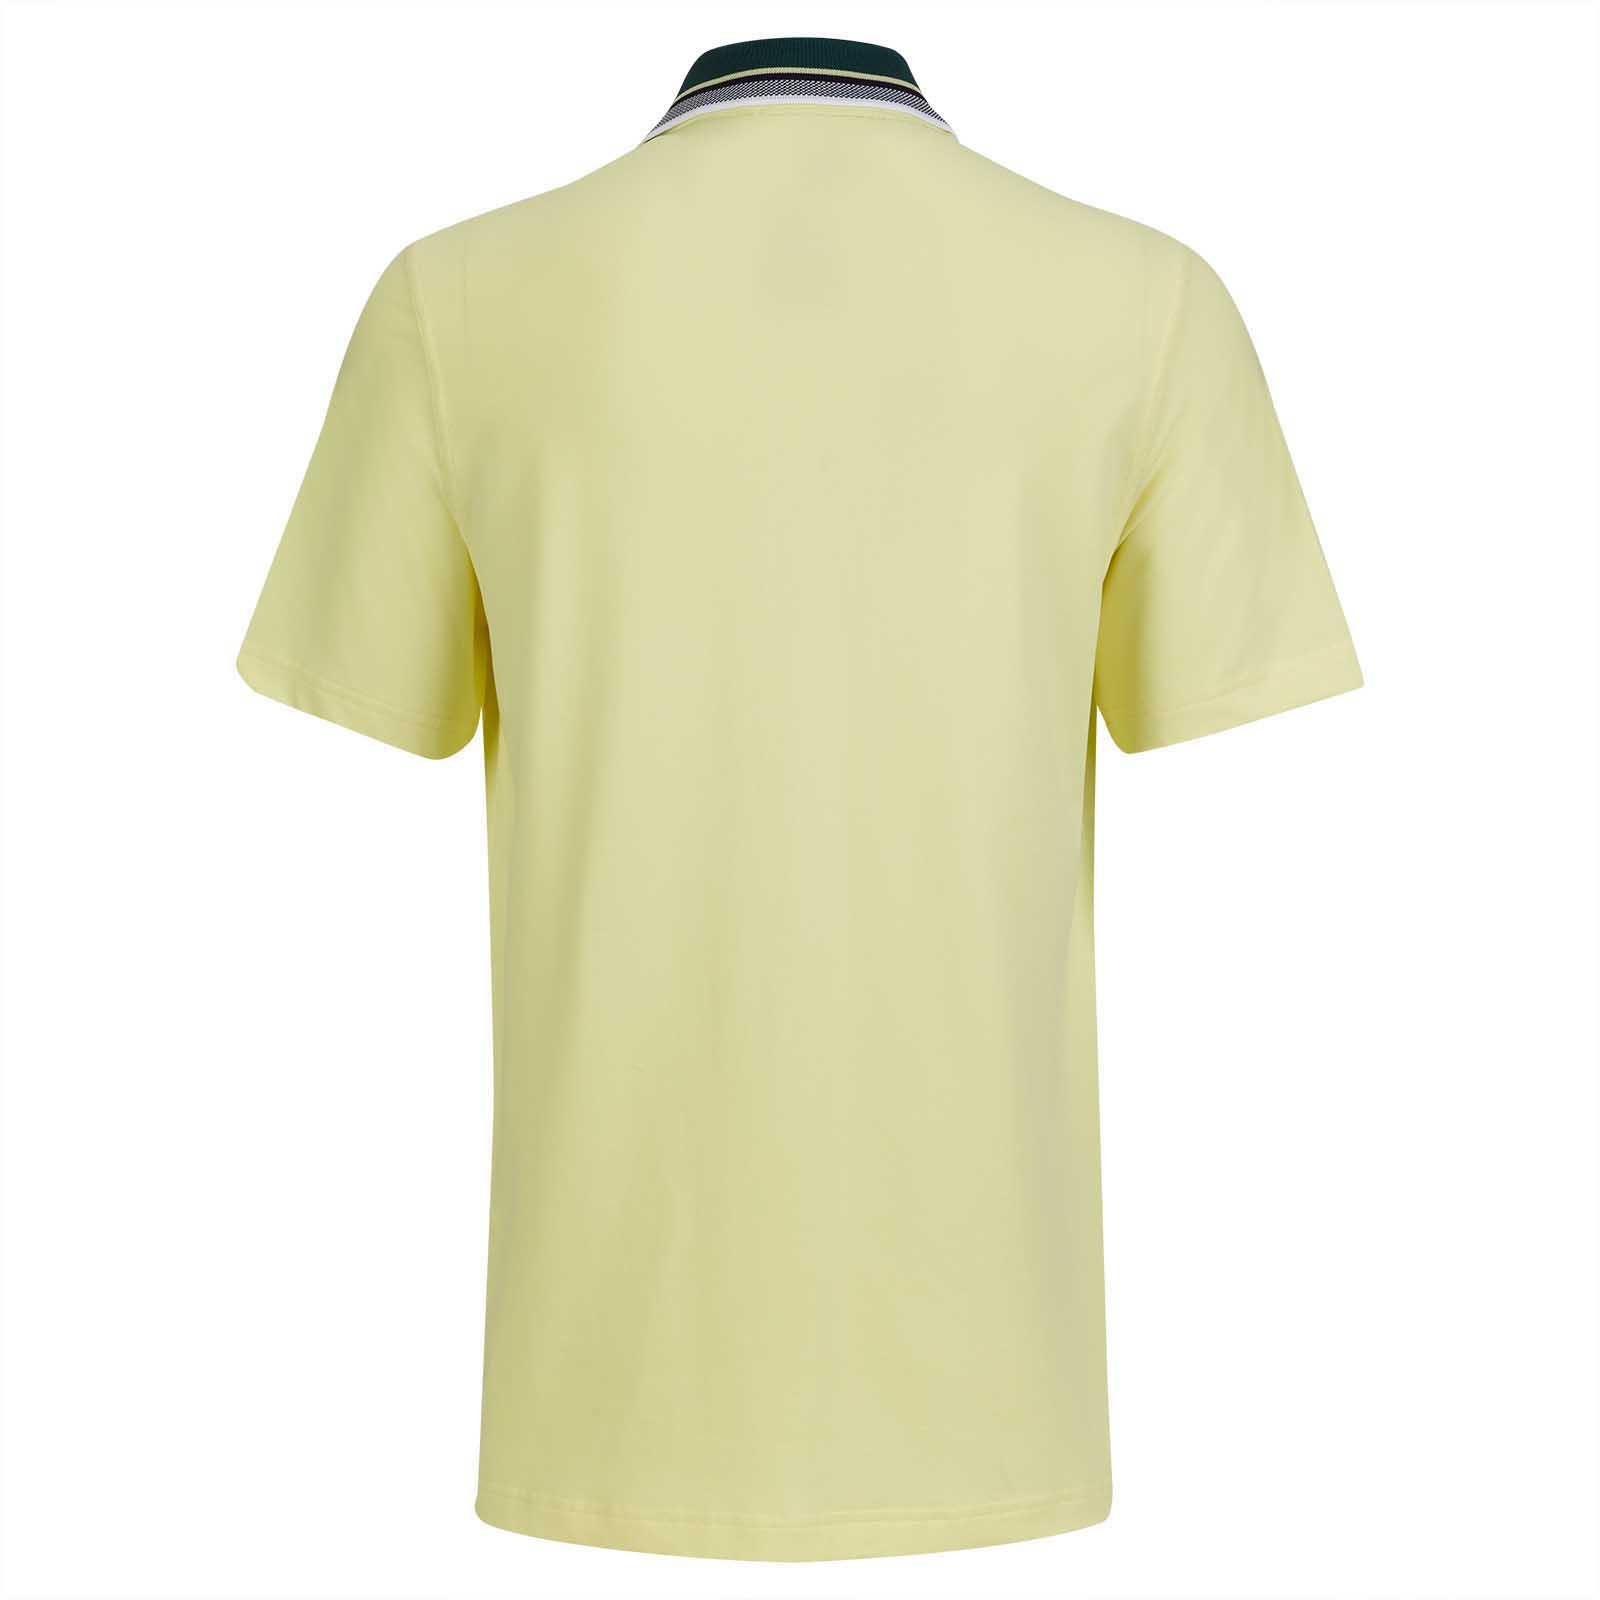 Herren Kurzarm Stretch-Polohemd mit Sun Protection